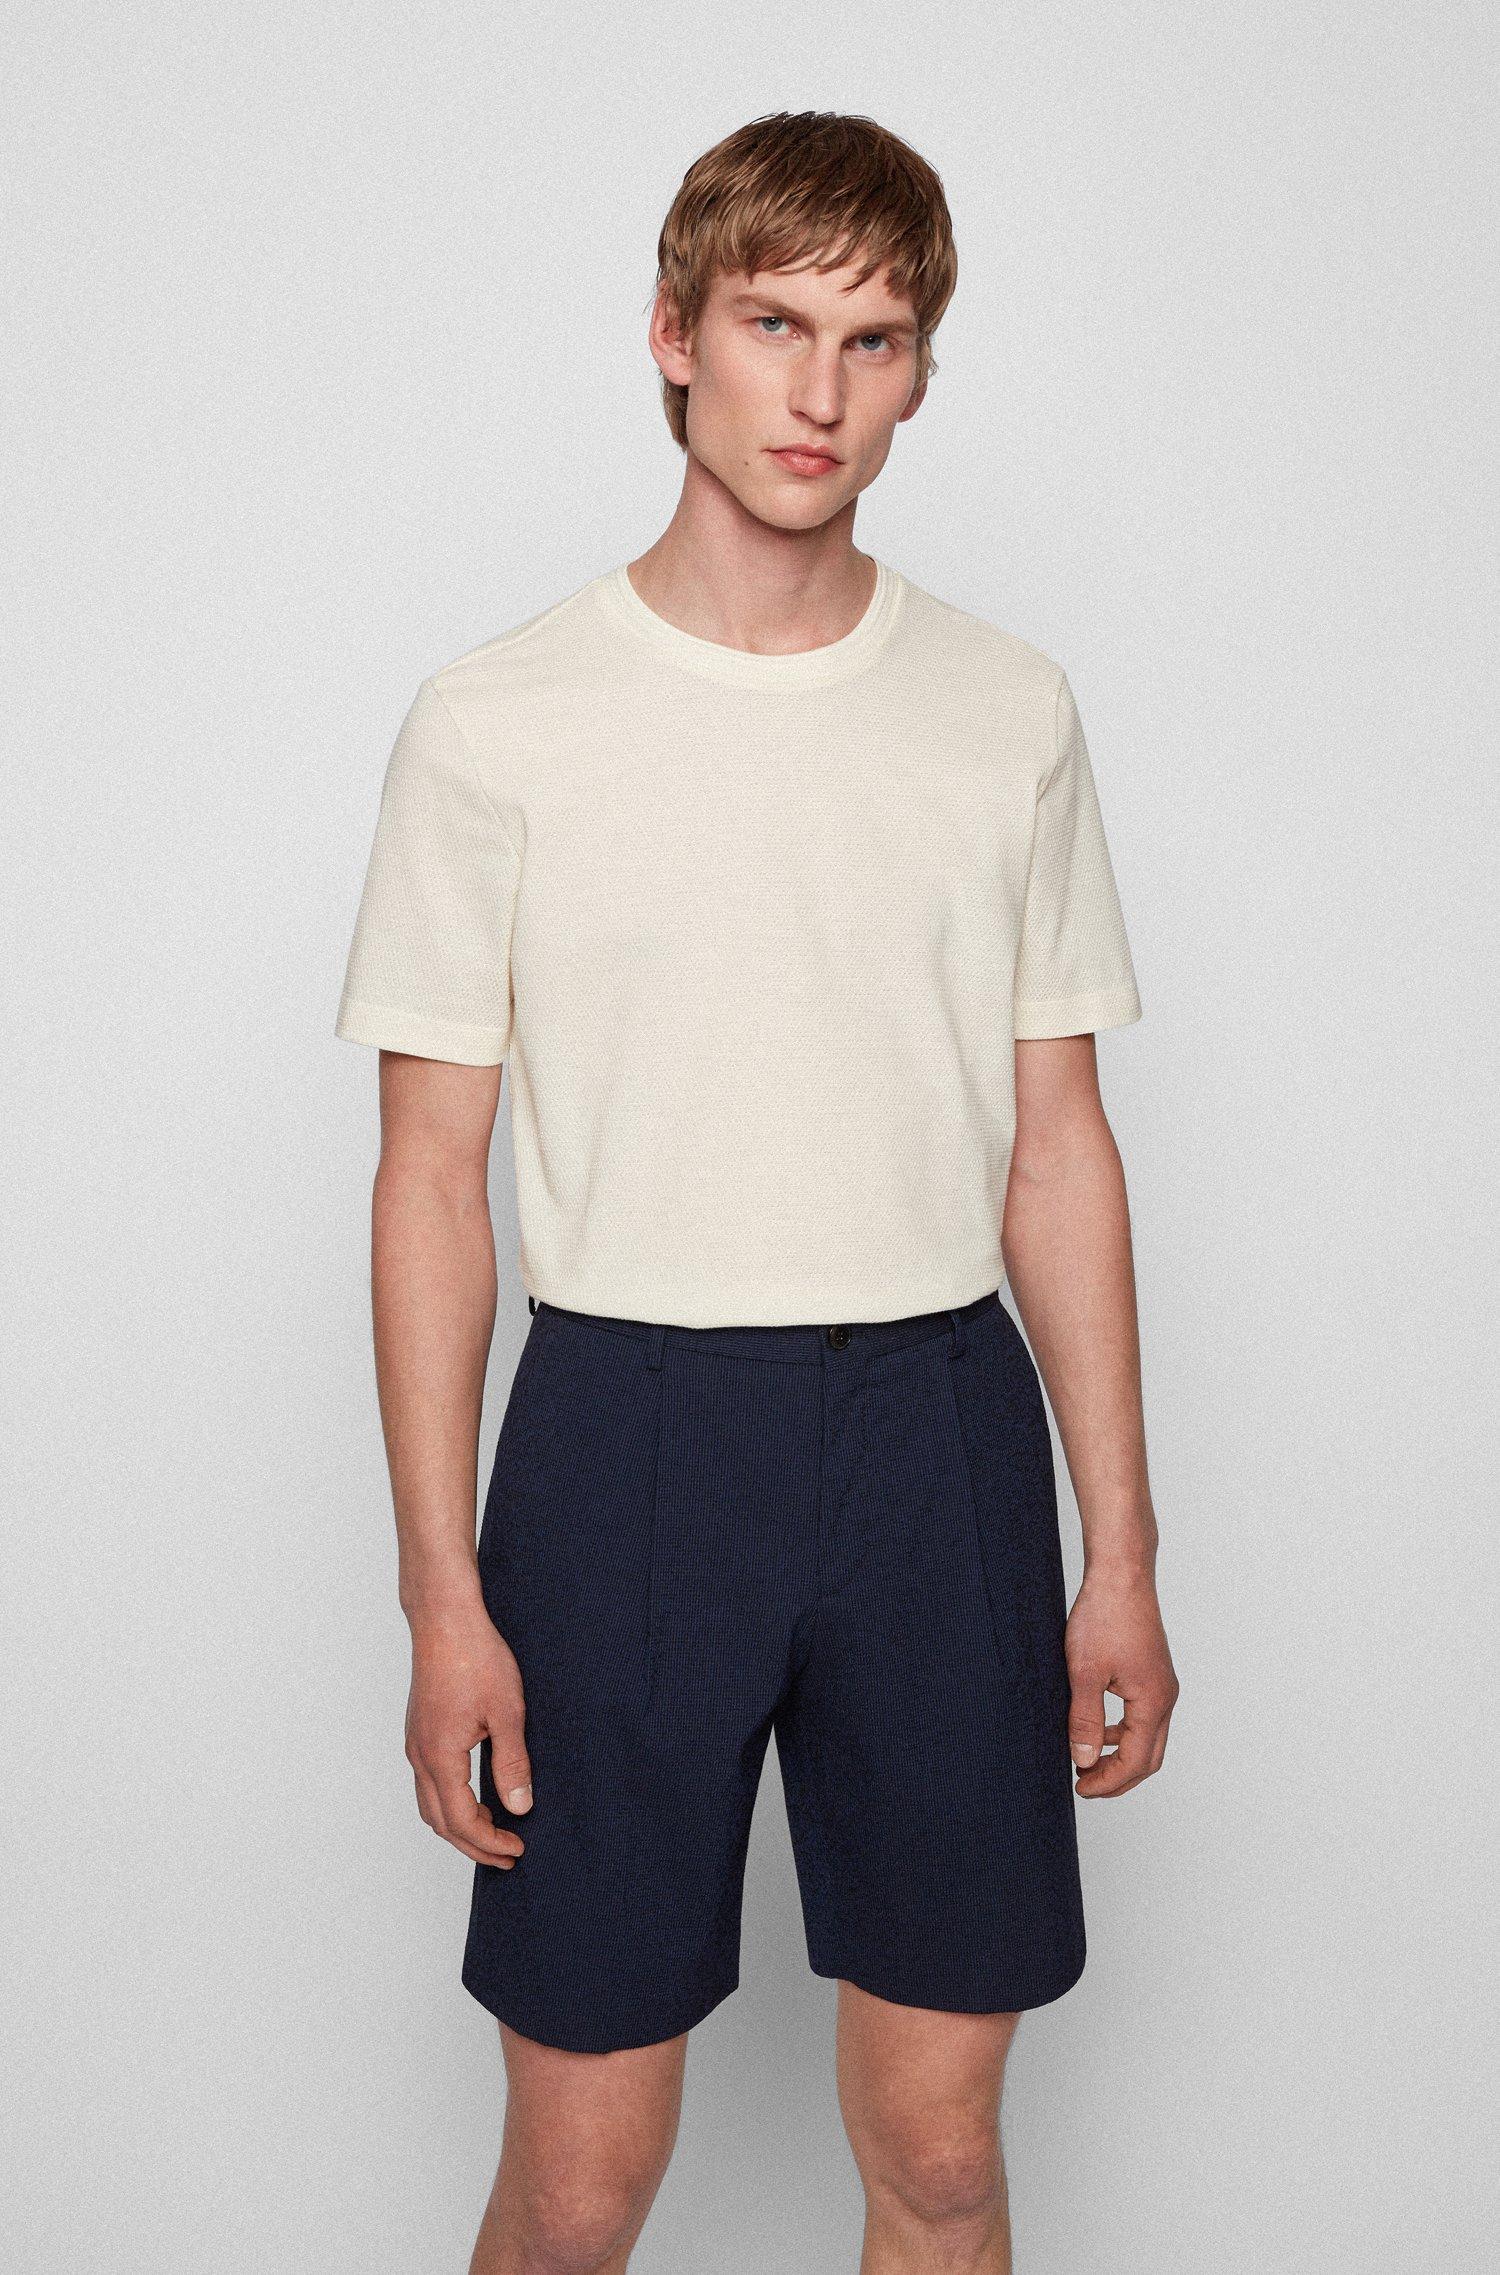 Cotton-blend T-shirt with bubble-jacquard structure, White